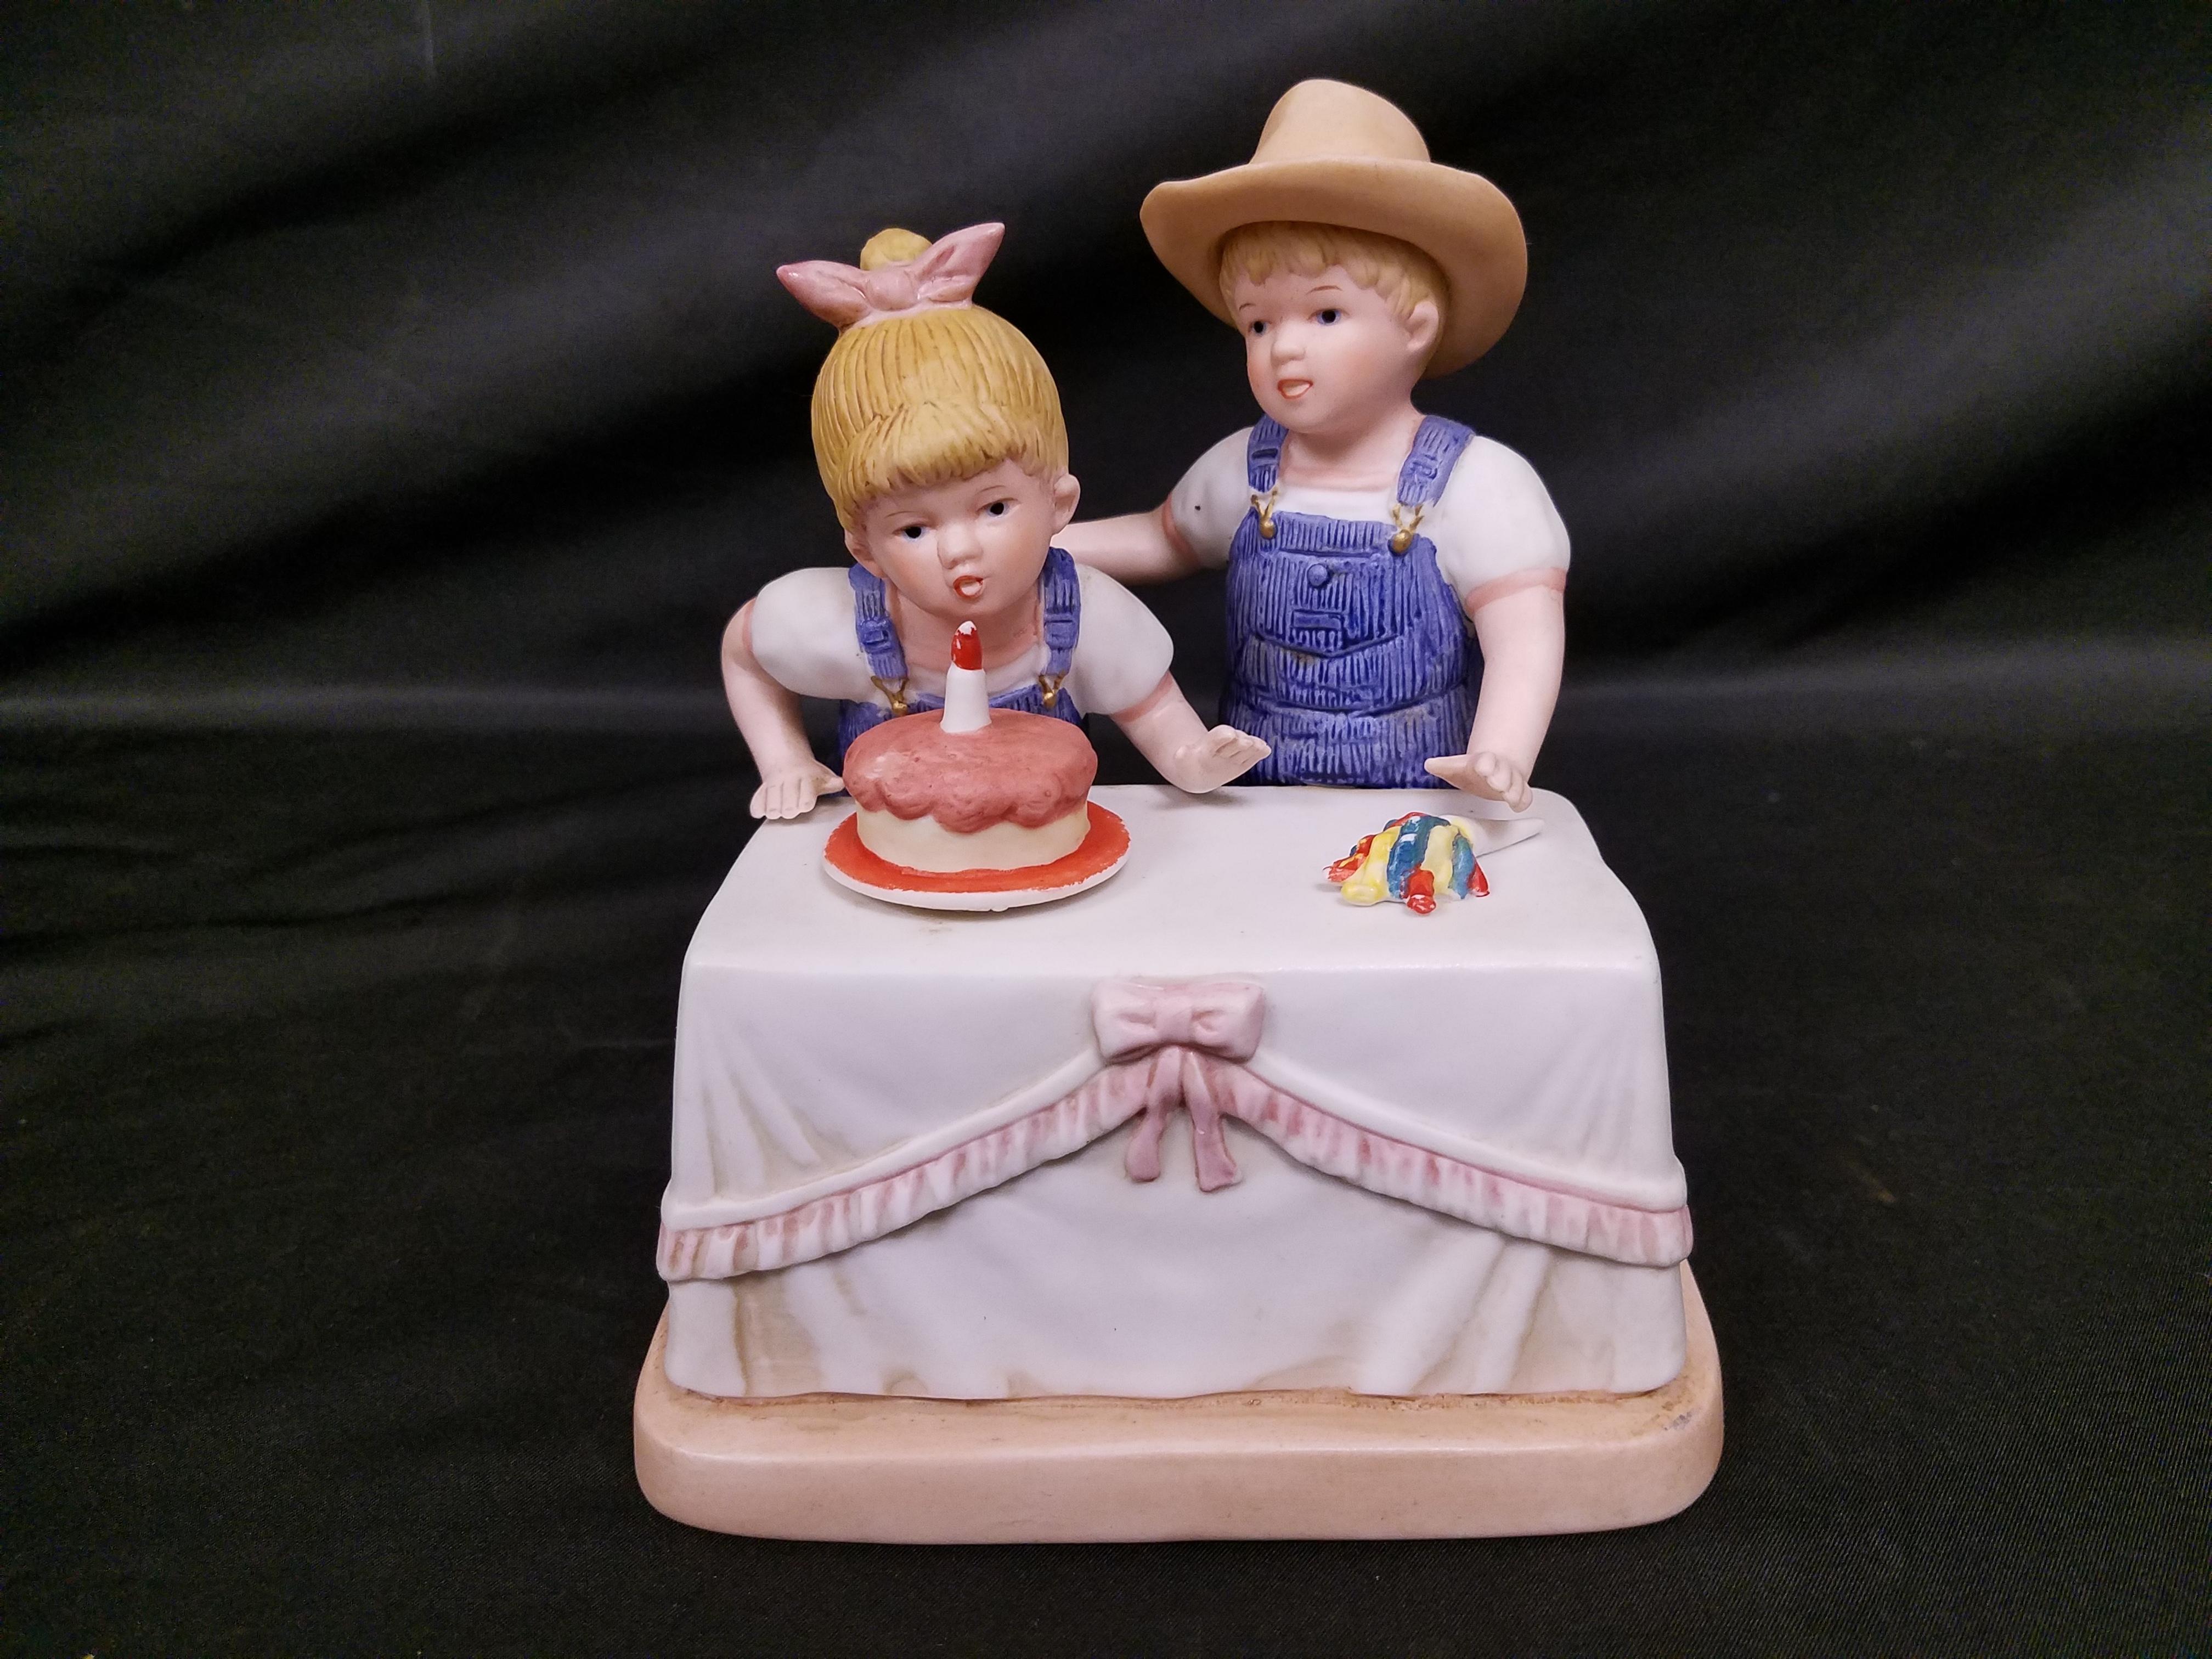 DENIM DAYS BY HOMCO 1985: BOY AND GIRL BIRTHDAY